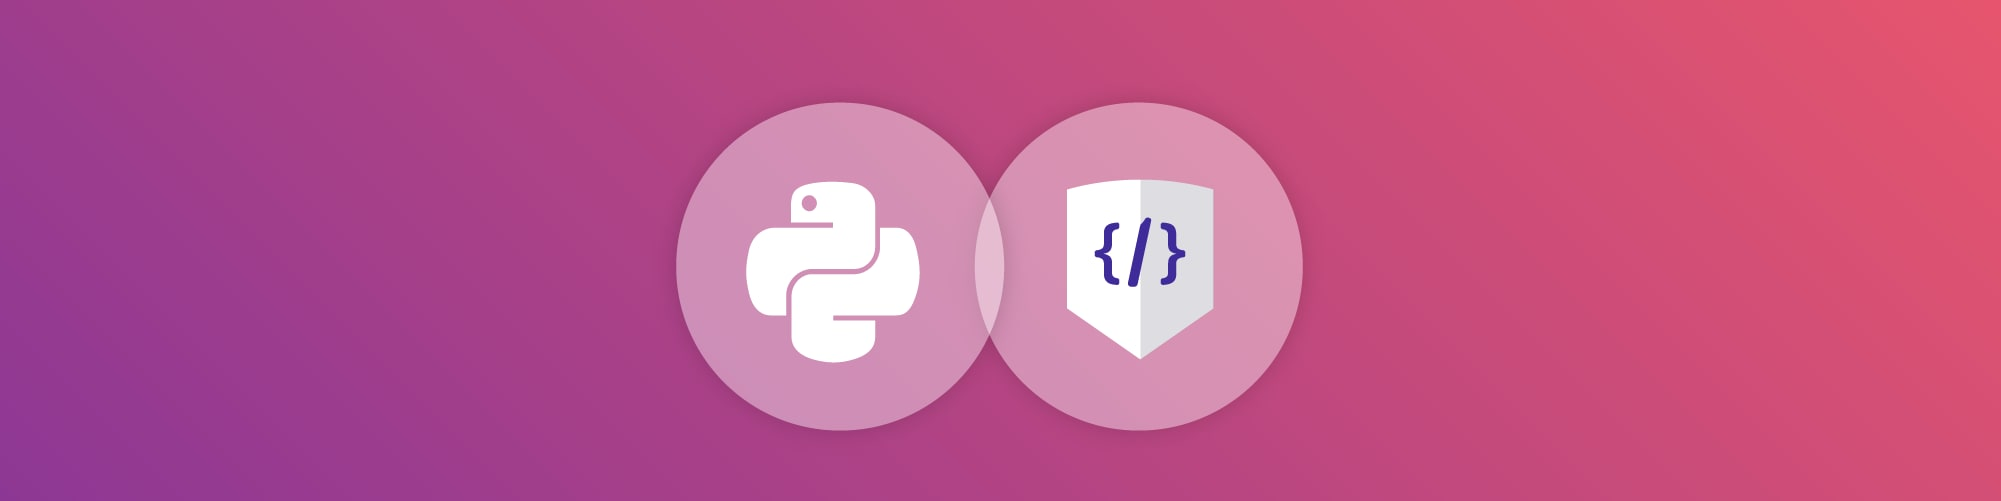 Snyk Code supports Python